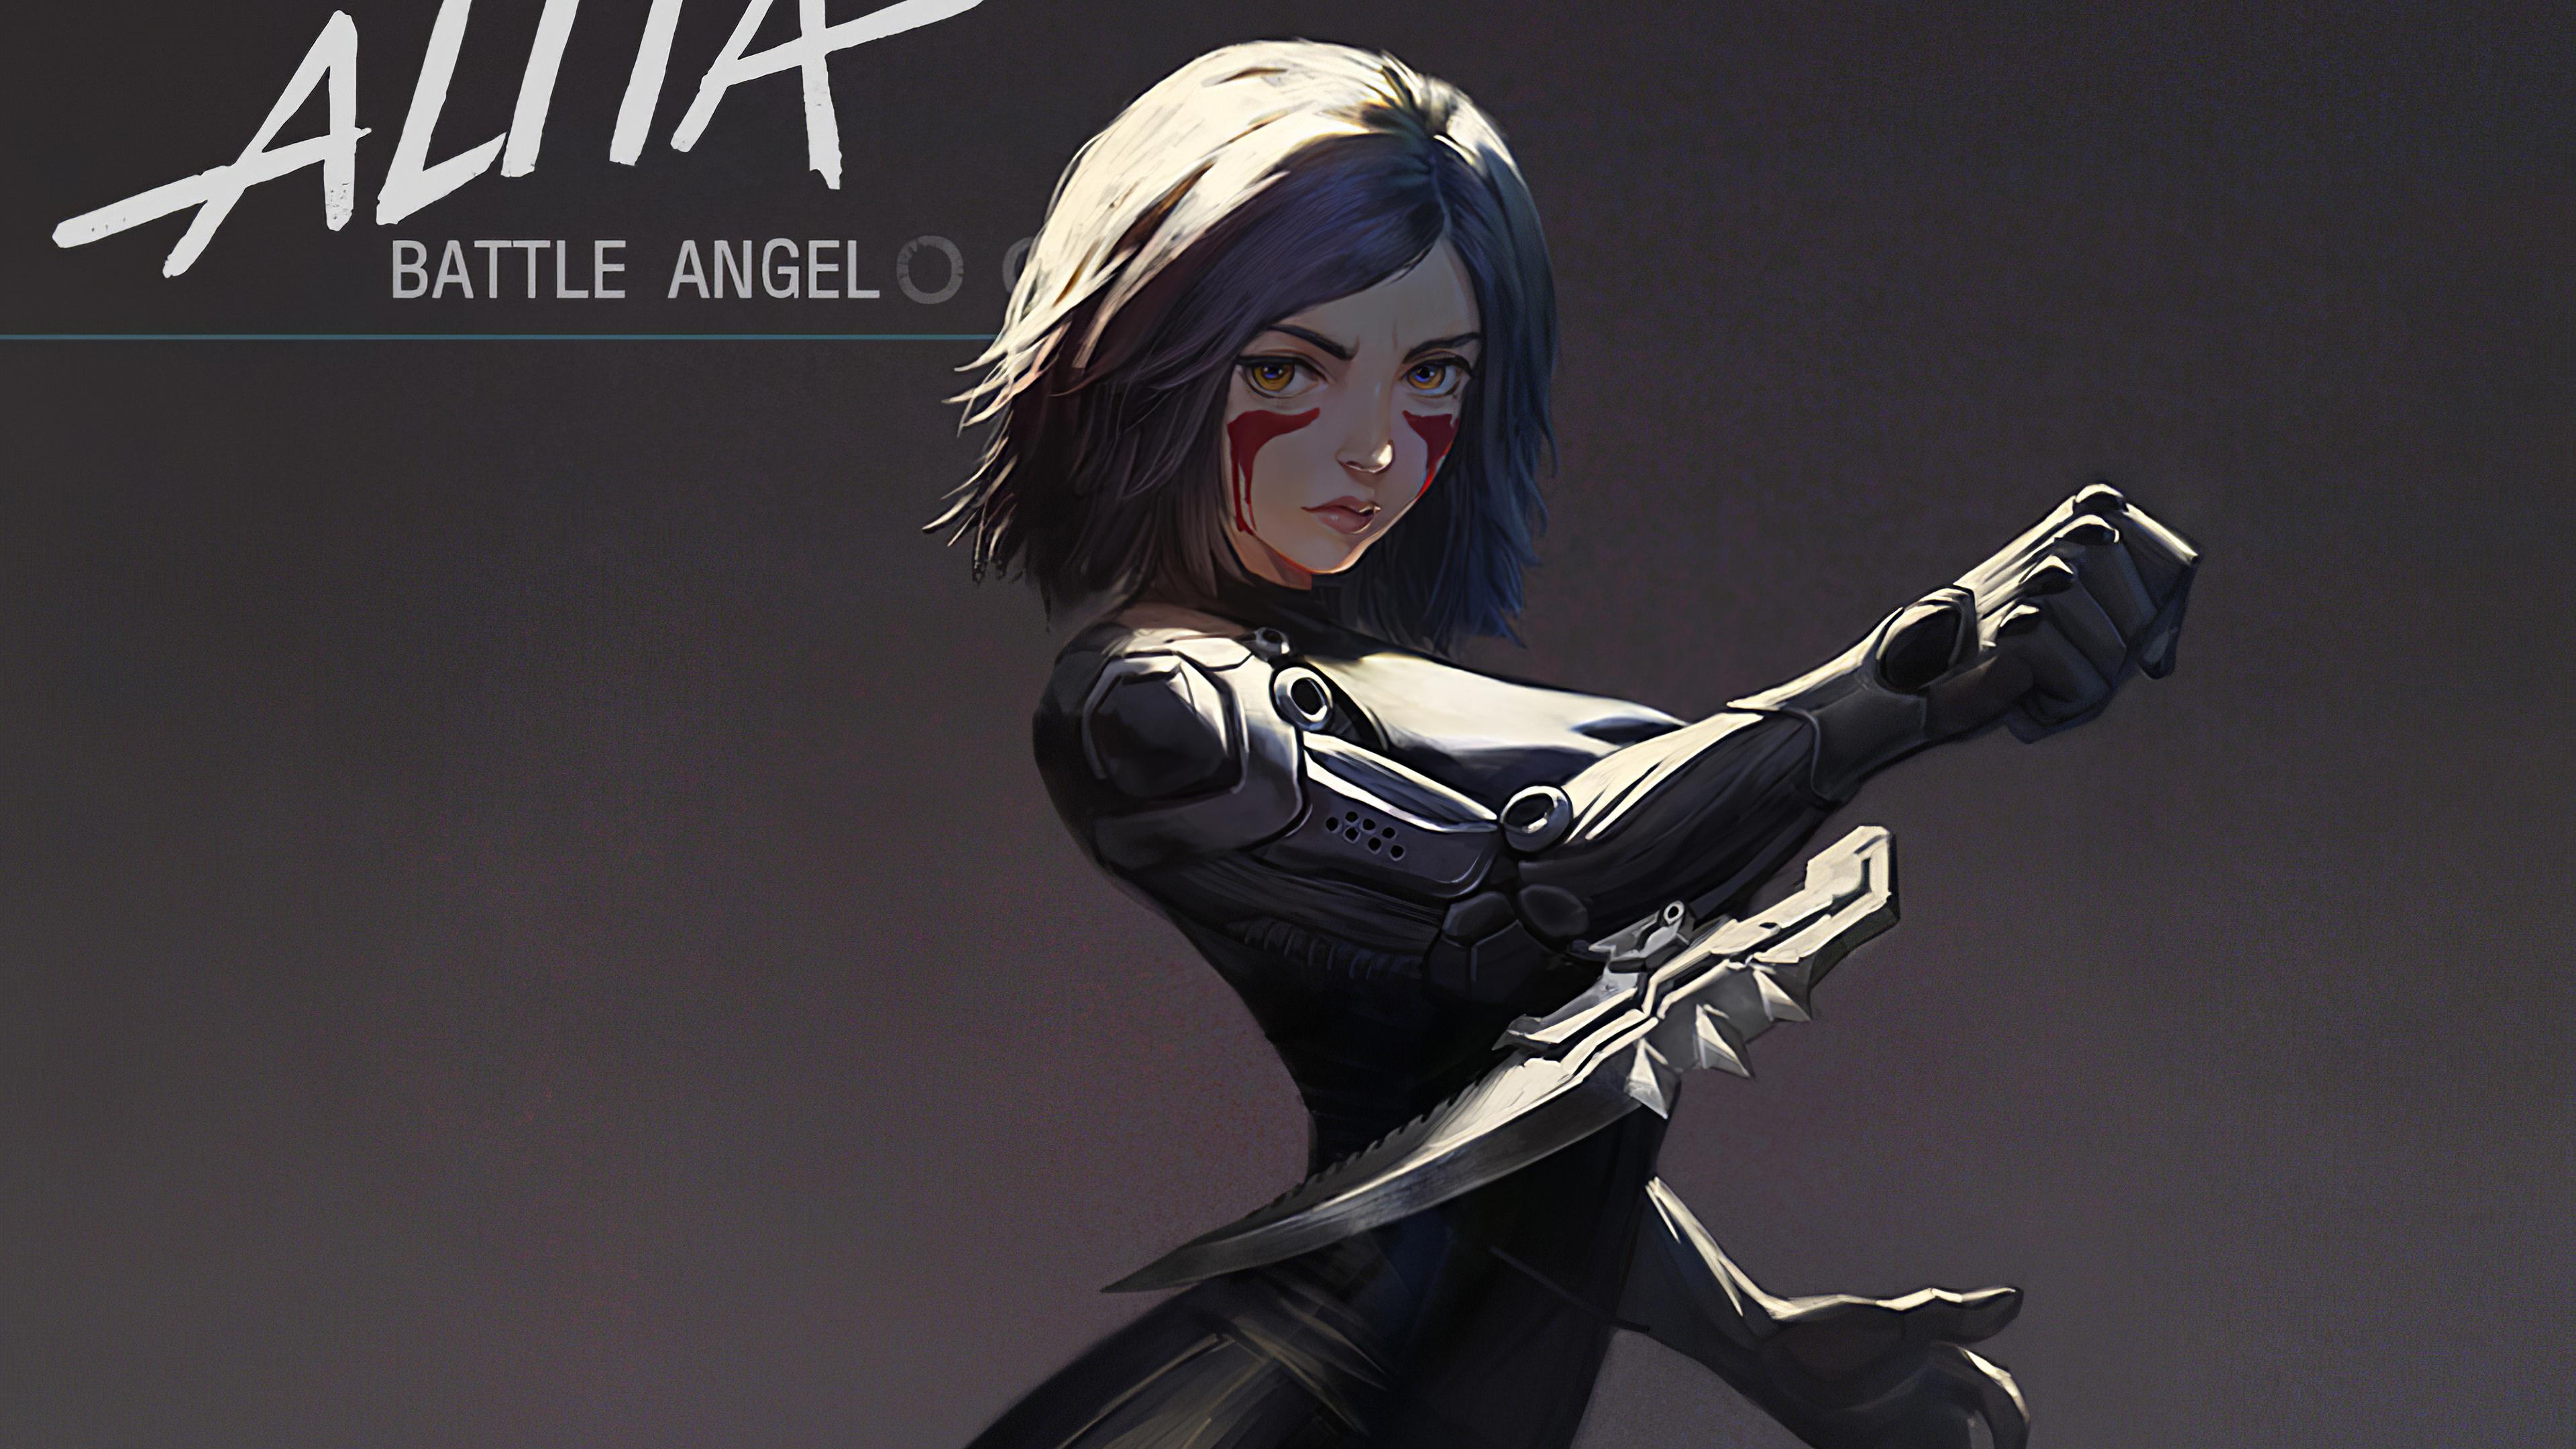 alita battle angel fanartwork 1578255211 - Alita Battle Angel Fanartwork -